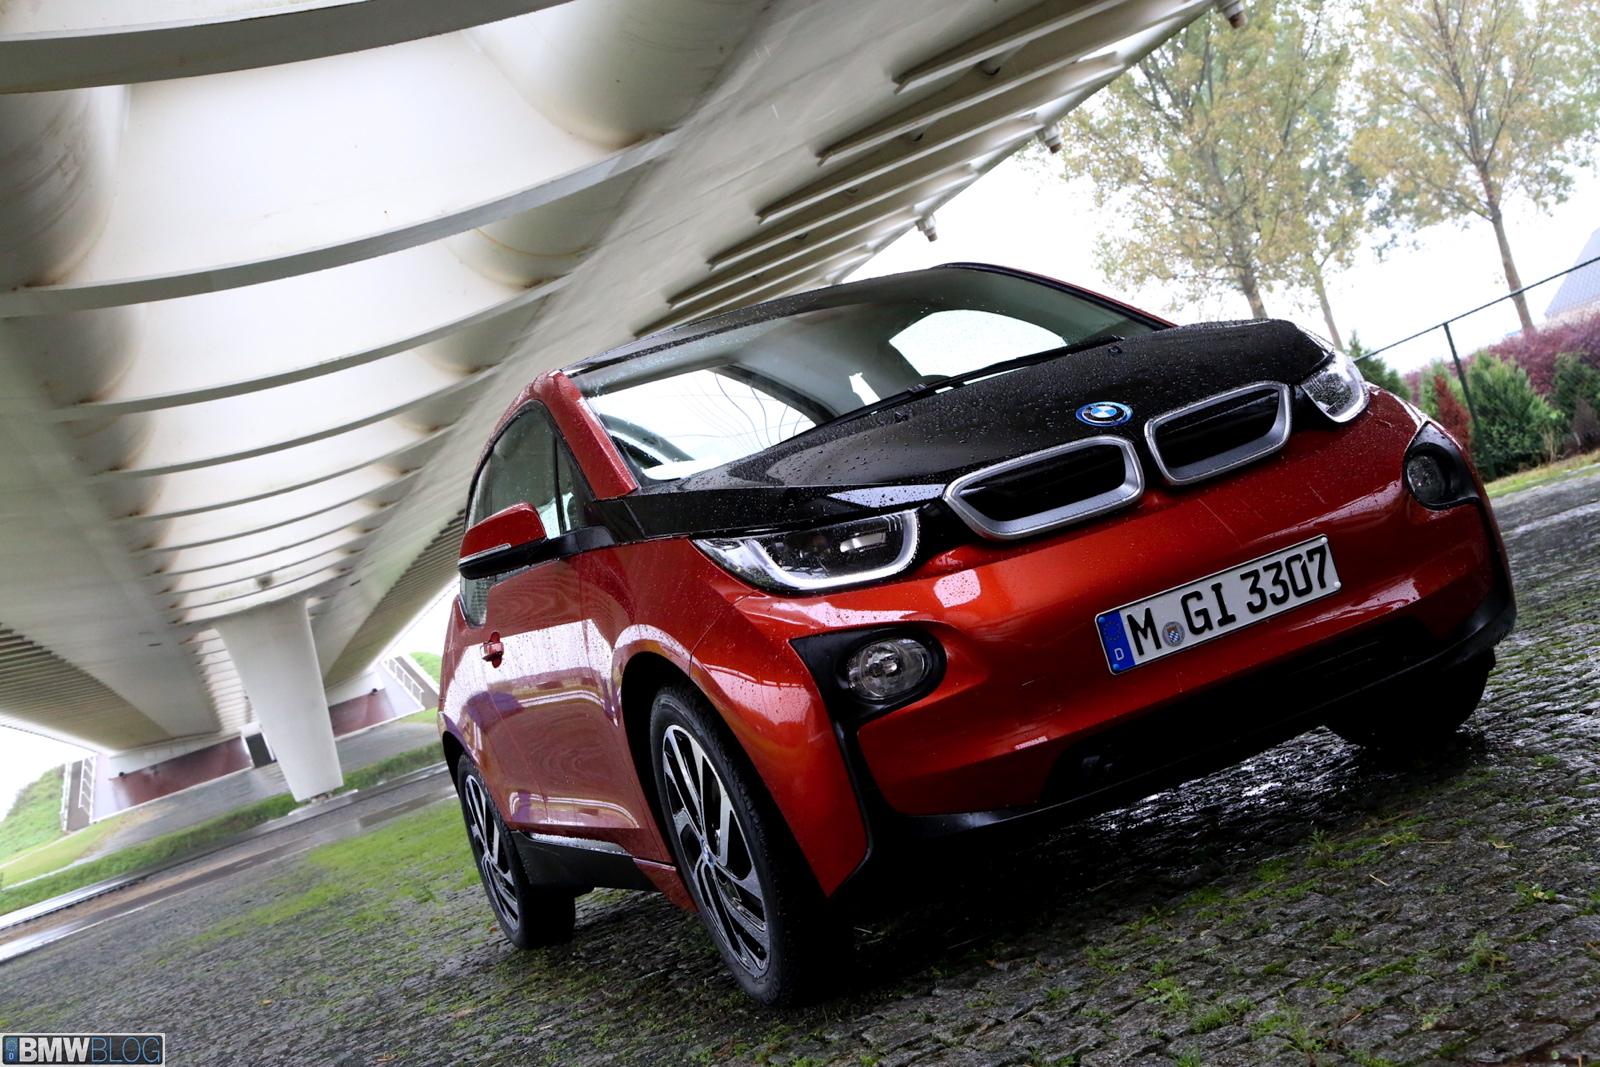 BMW i3 review Shawn Molnar BMWBLOG 502